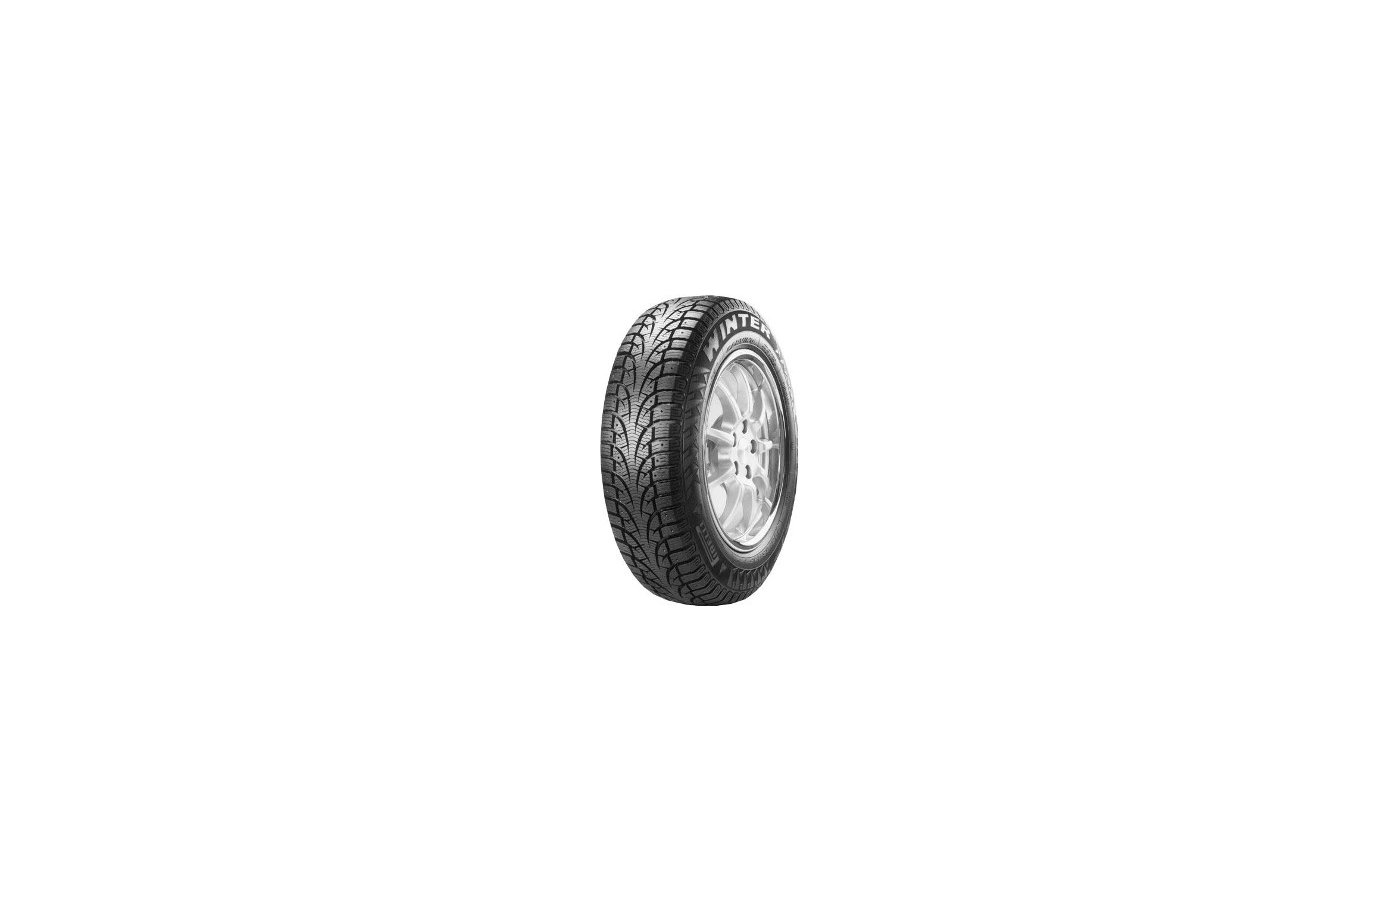 Шина Pirelli Winter Carving Edge 175/70 R14 TL 84T шип